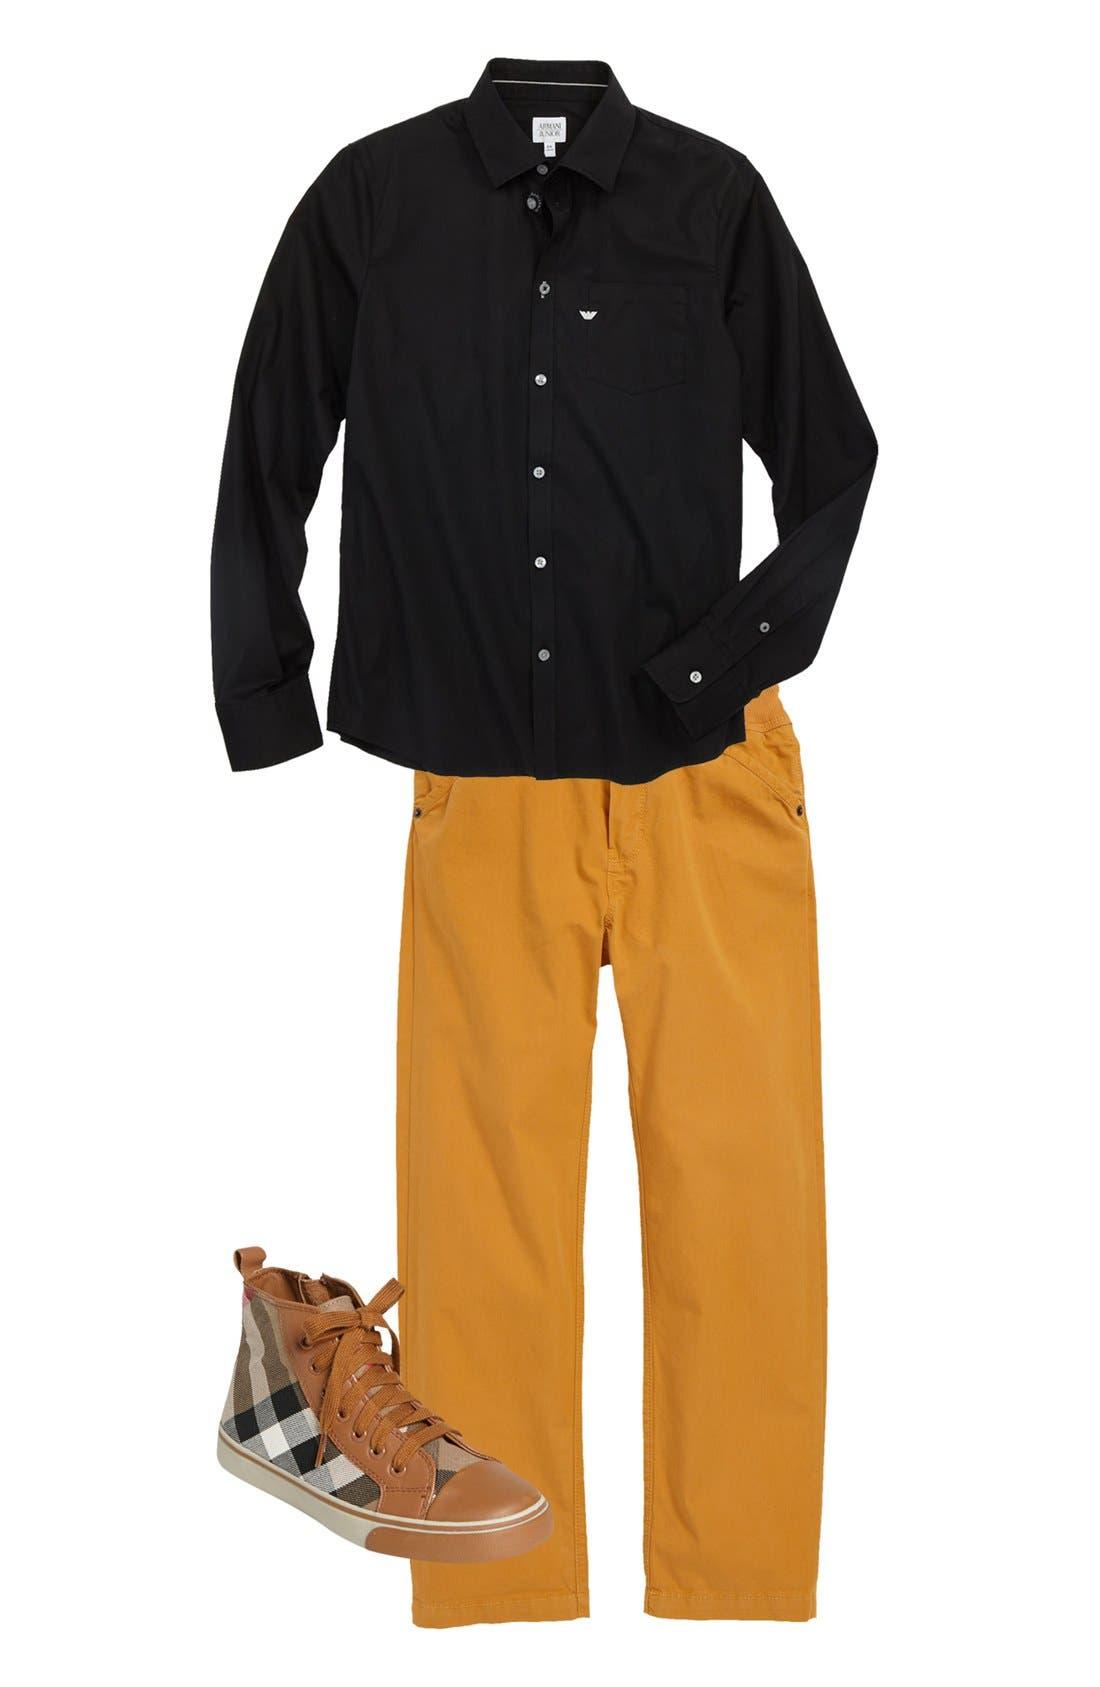 Alternate Image 1 Selected - Armani Junior Shirt, LITTLE MARC JACOBS Pants & Burberry Sneaker (Big Boys)